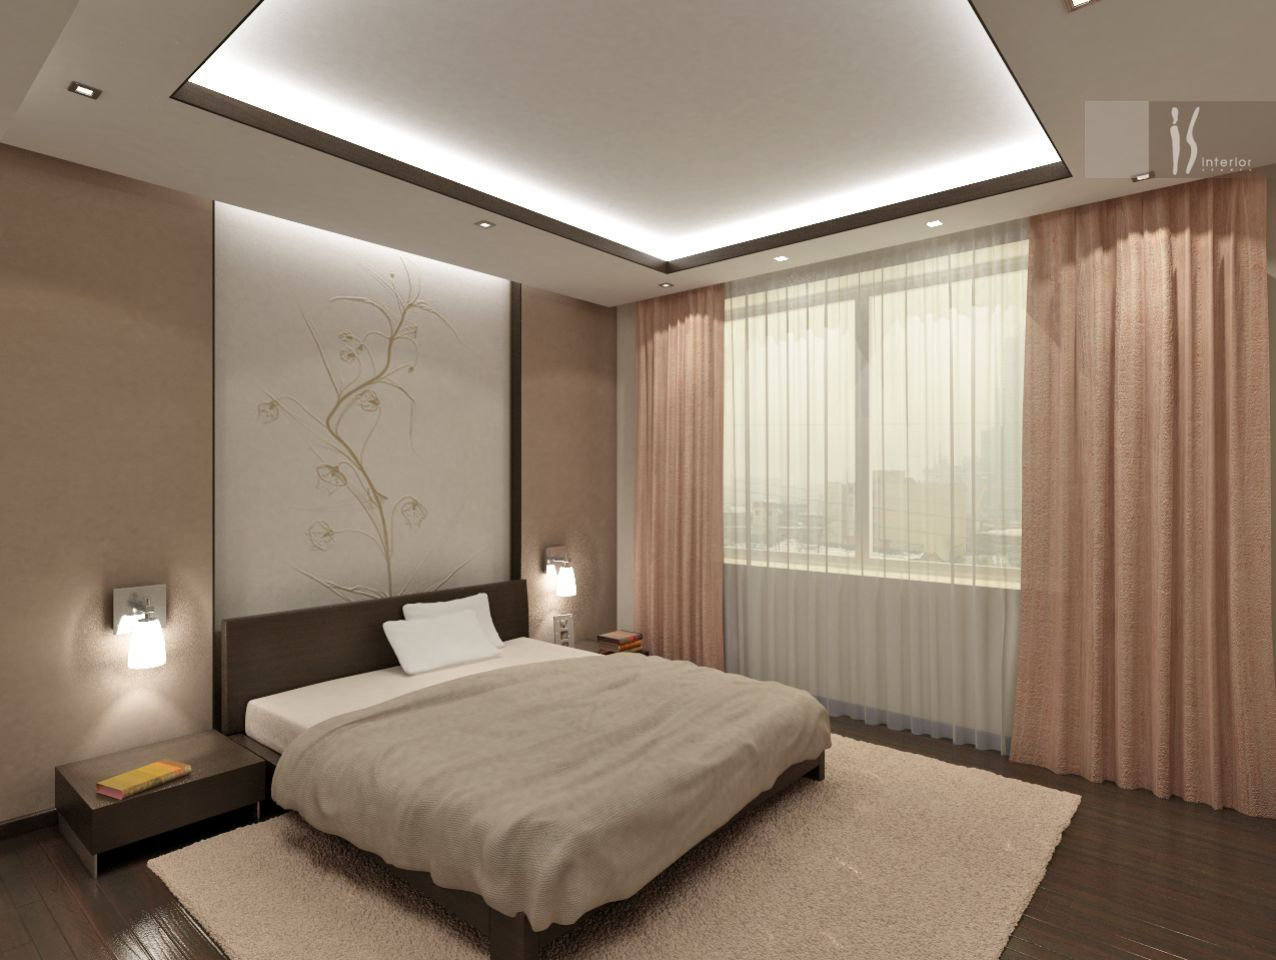 Дизайн ремонт спальня фото